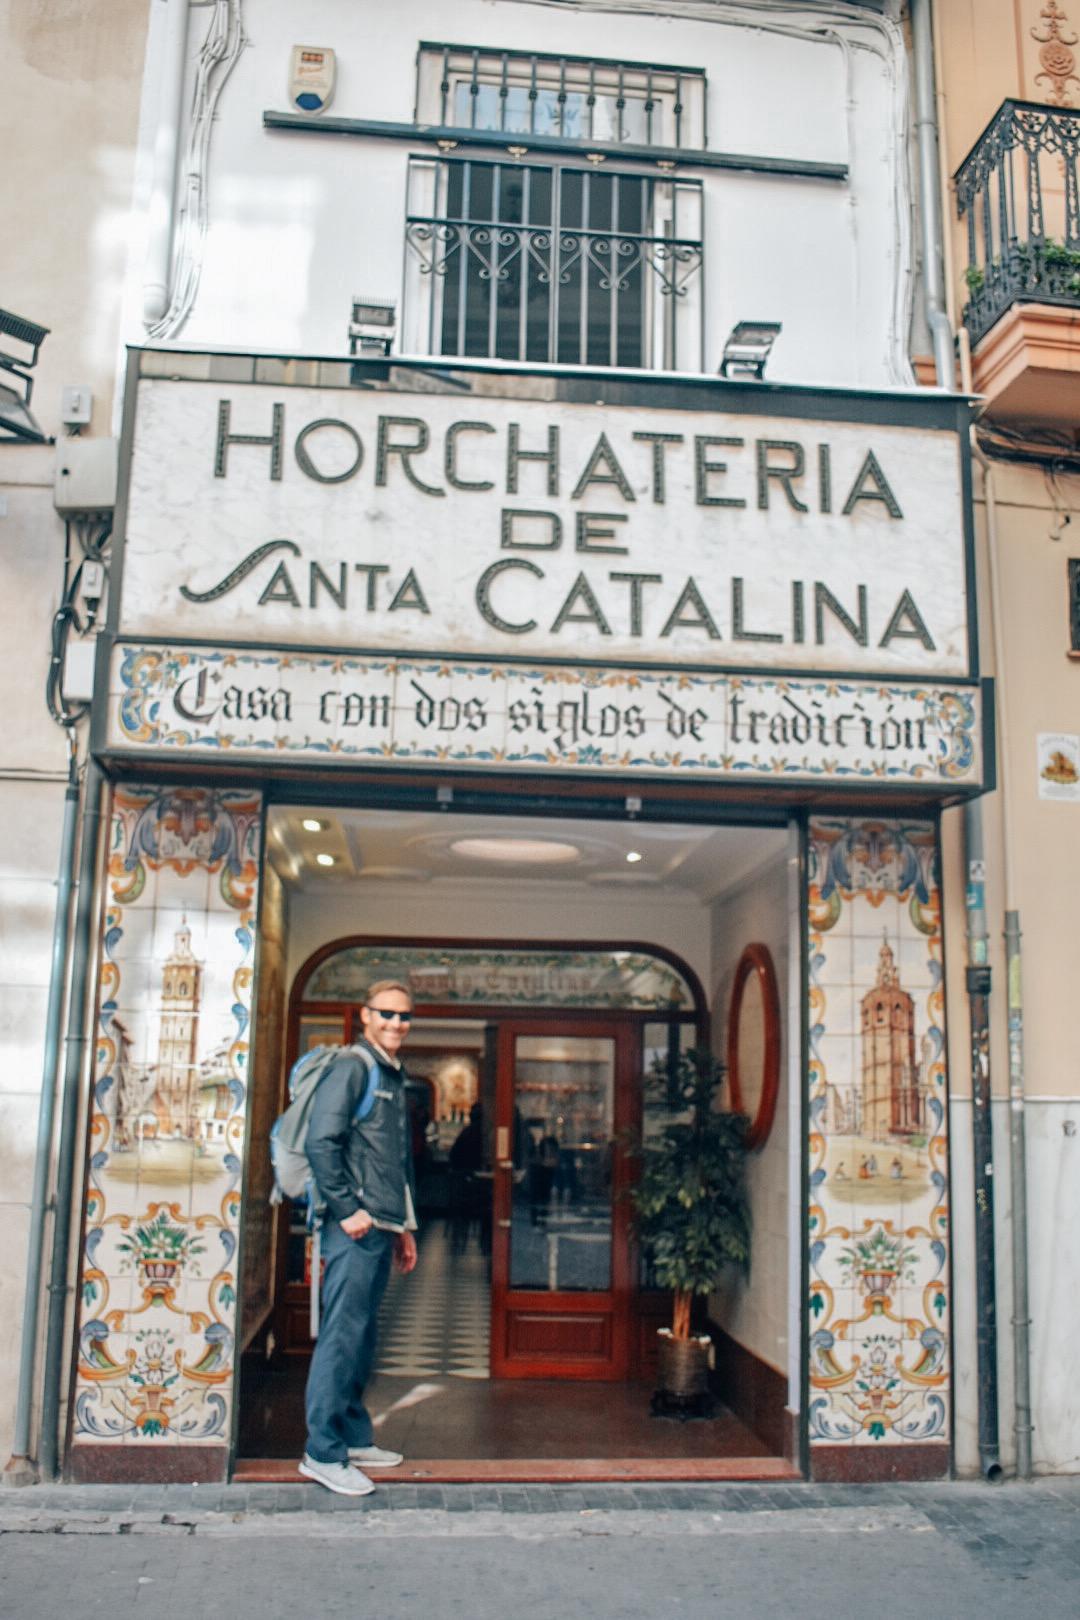 Valencia-Food-Tour-Horchateria-de-Santa-Catalina.jpg